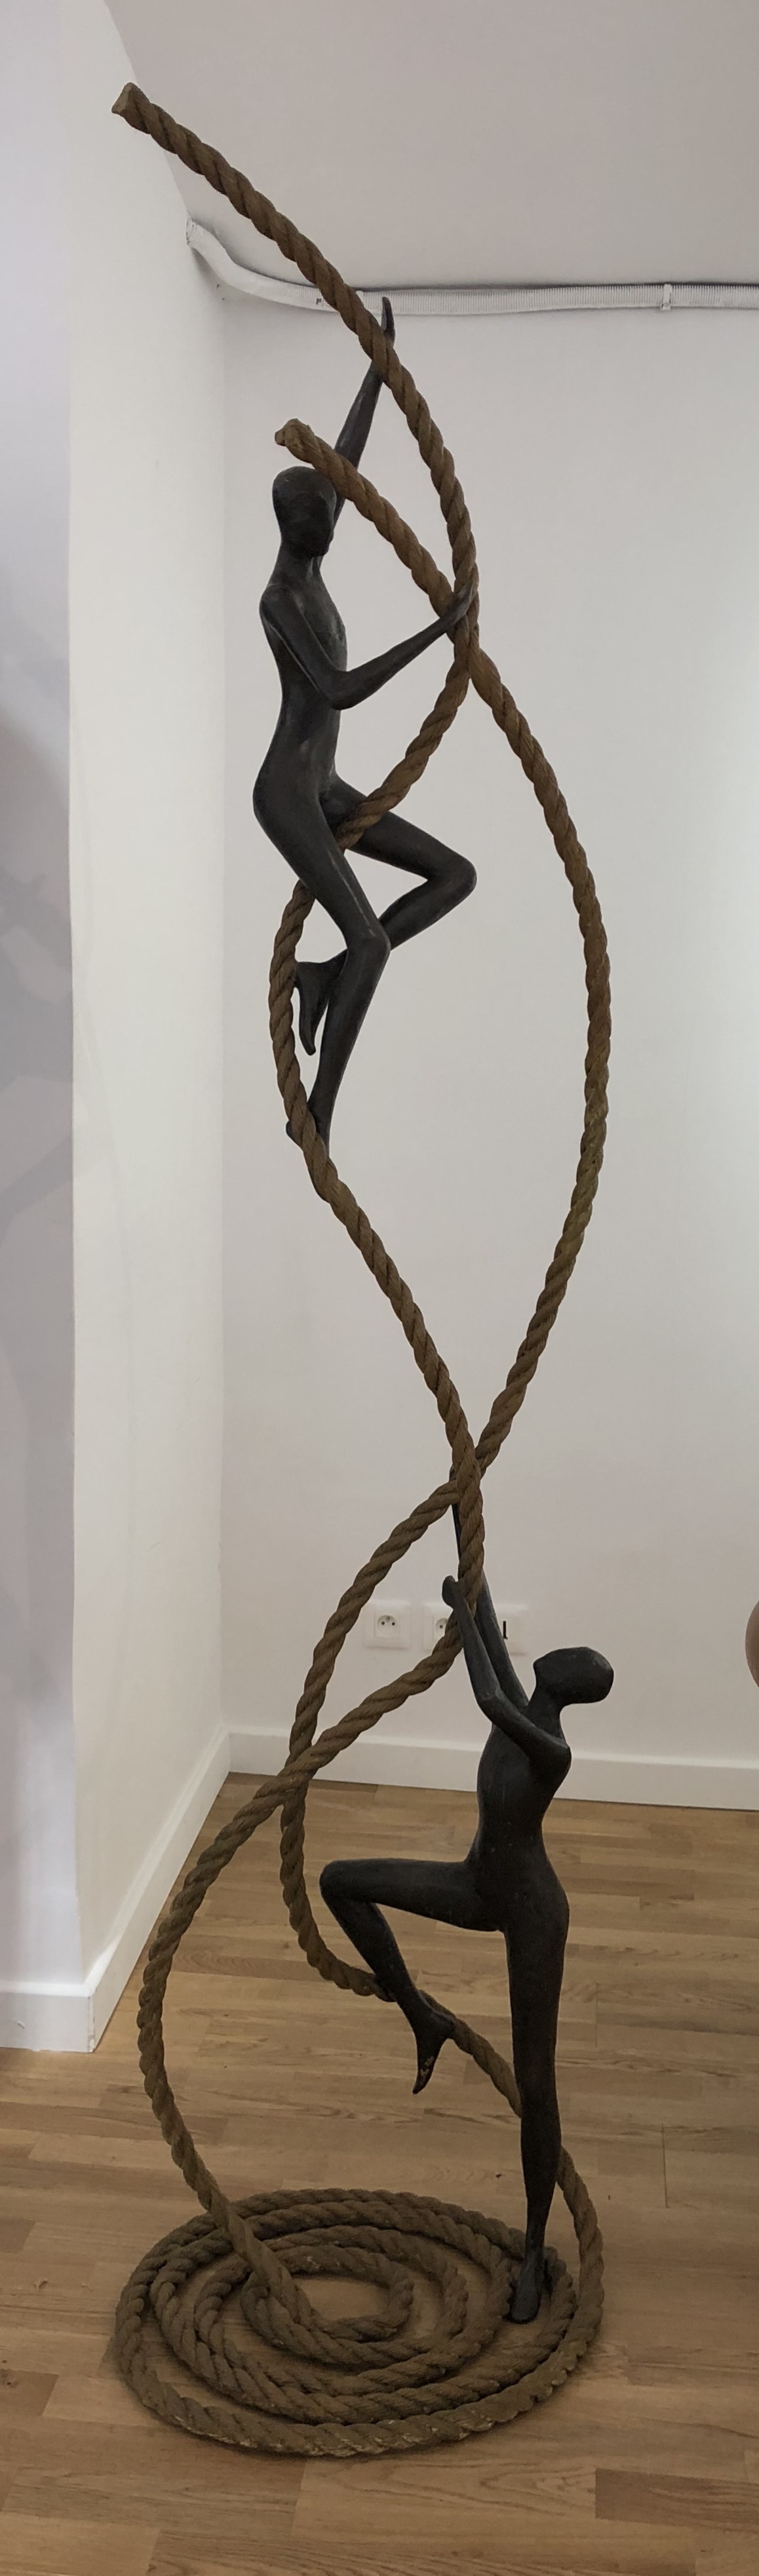 ENCOURAGEMENT  Bronze 310x75x85cm / 122x29,5x33,4 inches